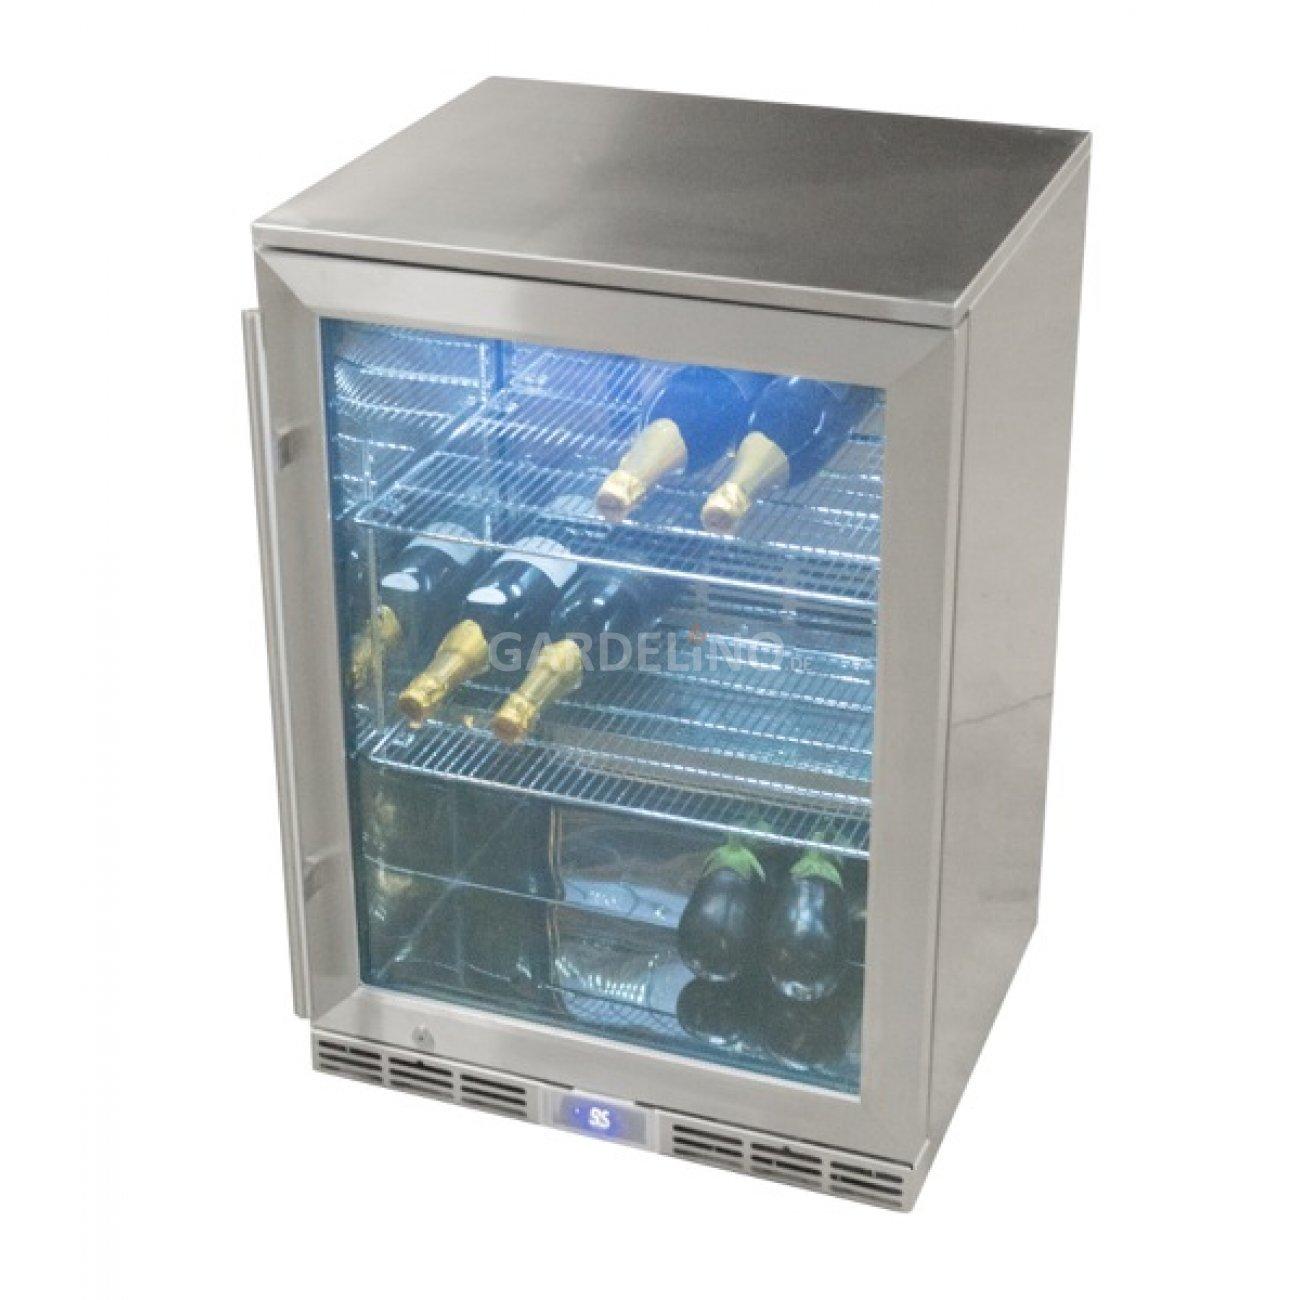 joko domus Outdoor Kühlschrank